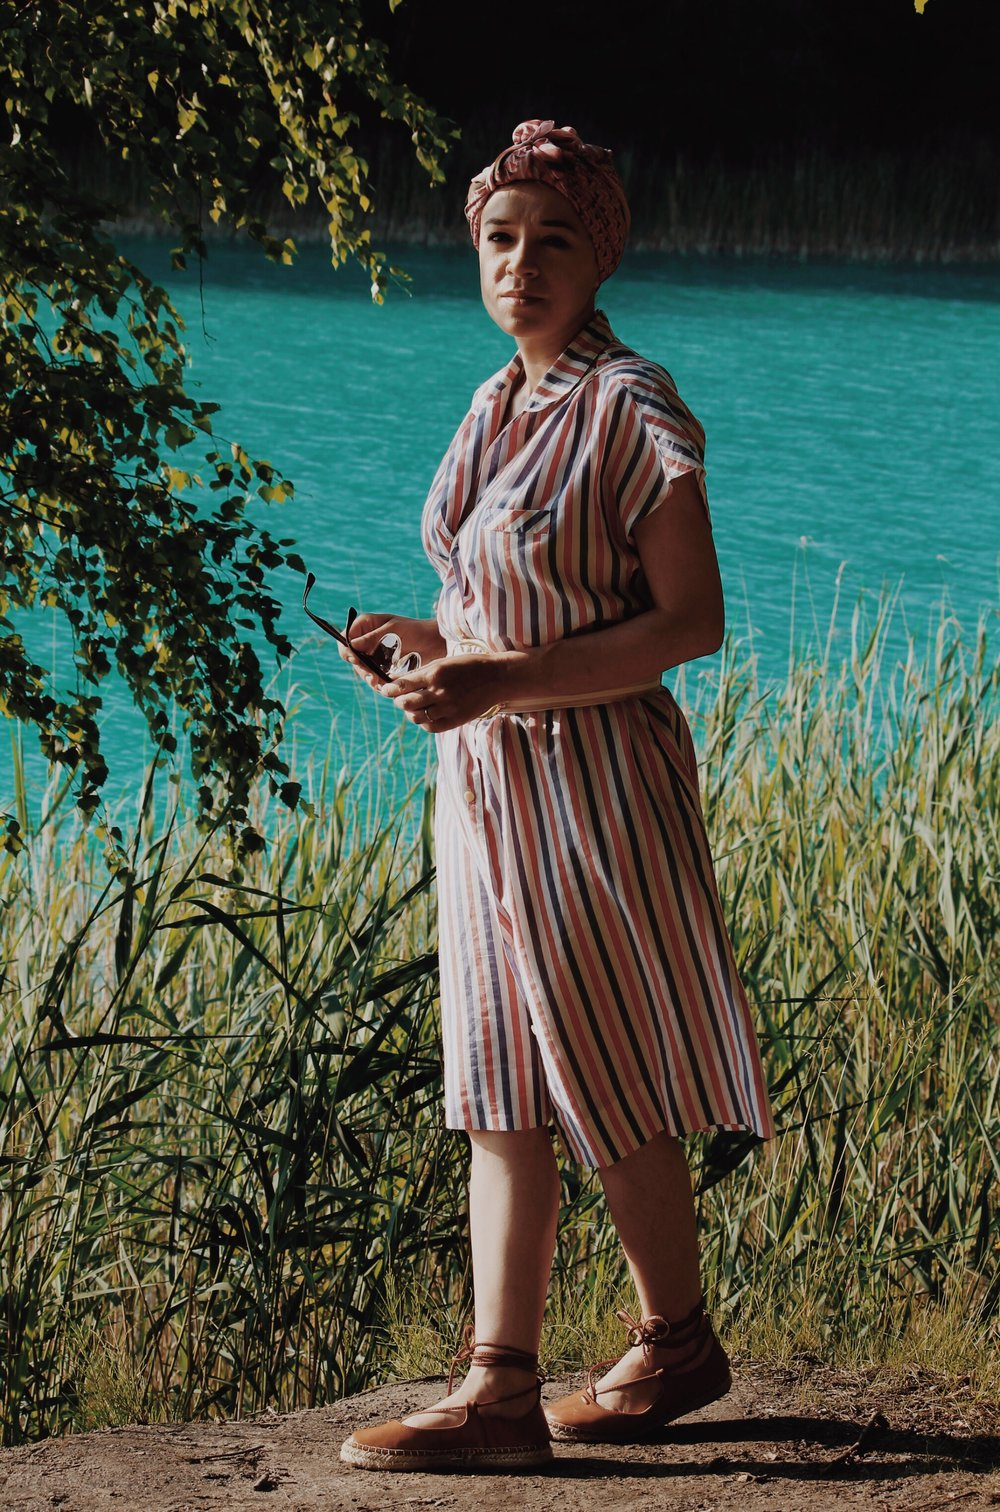 lazurowe jezioro retro style